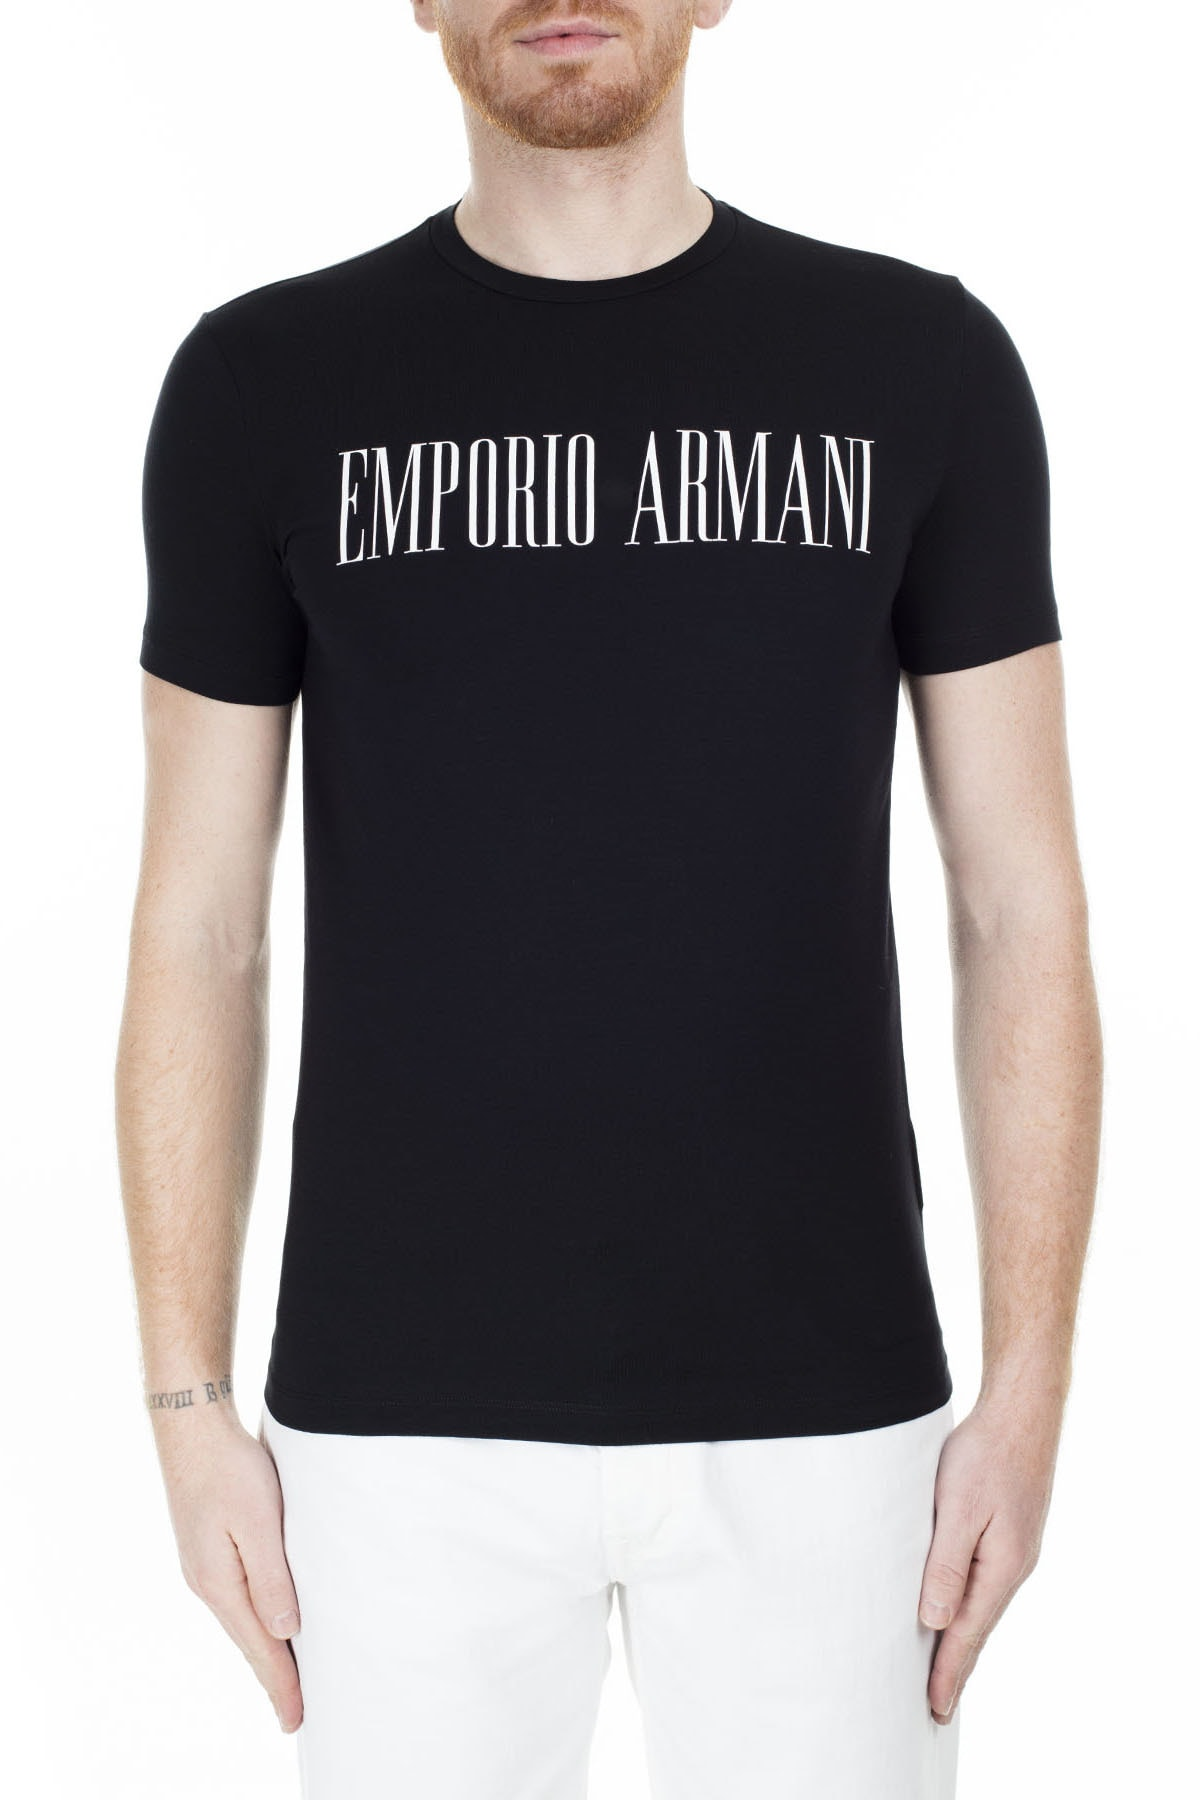 Emporio Armani Regular Fit T Shirt Erkek T Shirt S 6G1Td5 1J0Az 0002 S 6G1TD5 1J0AZ 0002 0